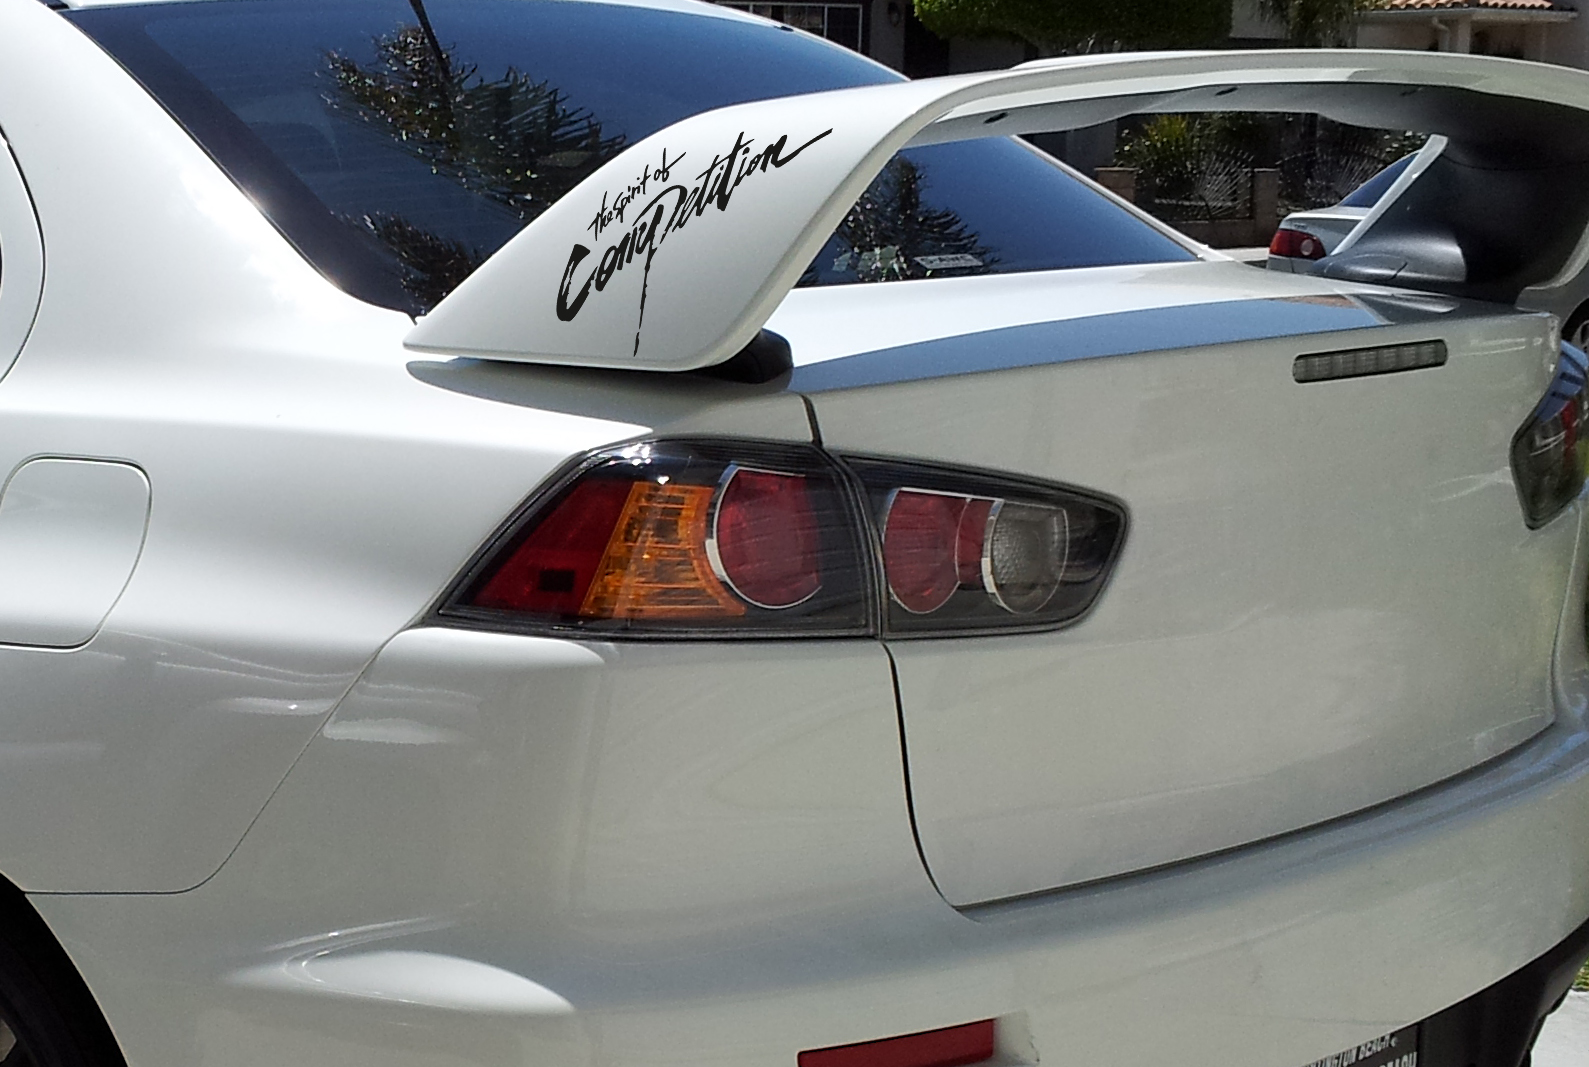 Car sticker design competition - 2x The Spirit Of Competition Racing Sport Wd 4x4 Car Mitsubishi Lancer Evo V Vi Vii Viii Ix X Vinyl Sticker Decal